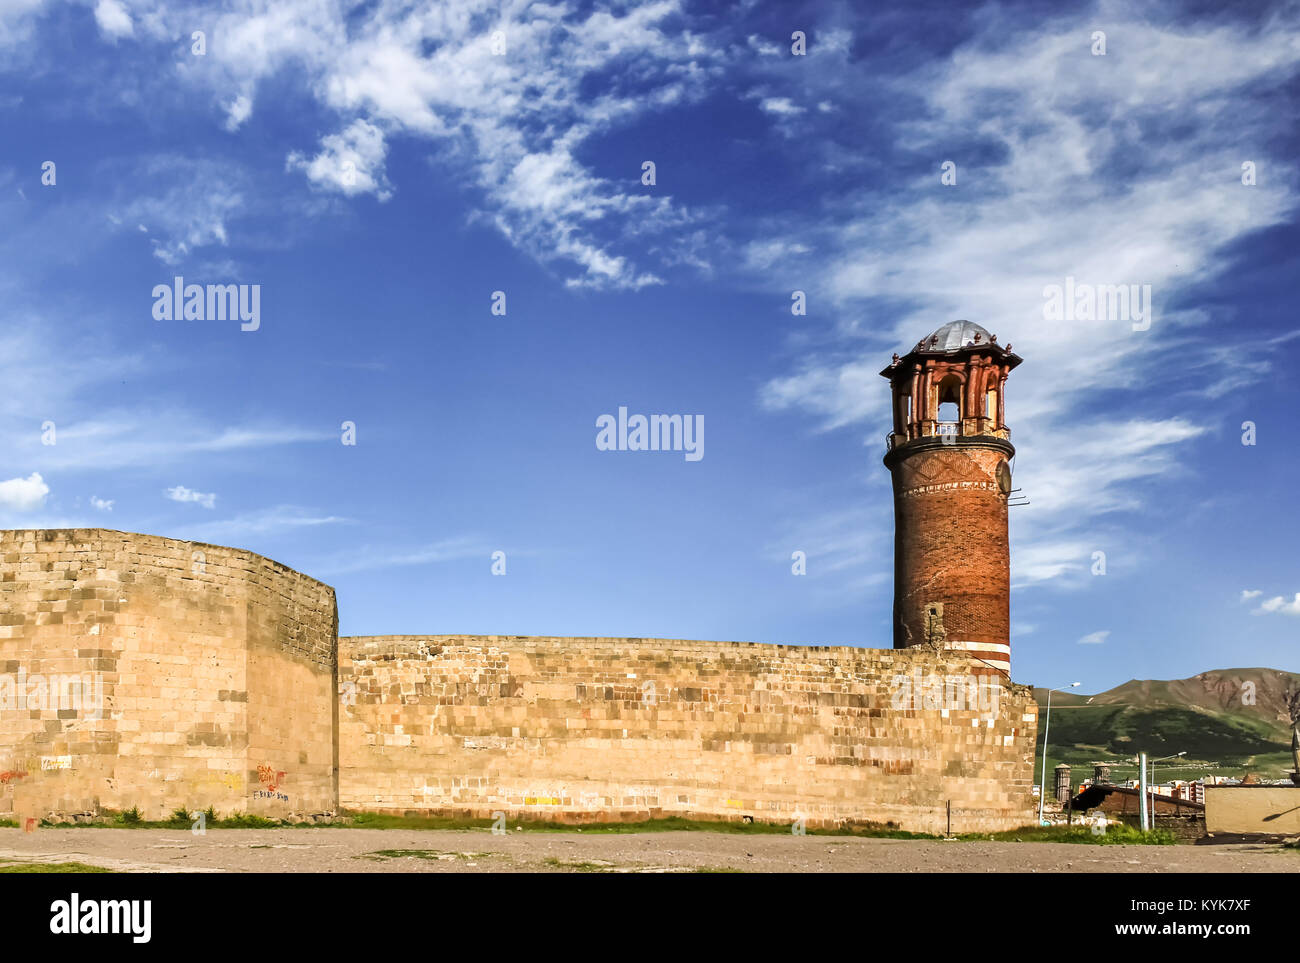 Exterior view of Tray Minaret or Clock tower, Erzurum Castle, Erzurum, Turkey.18 May 2017 - Stock Image